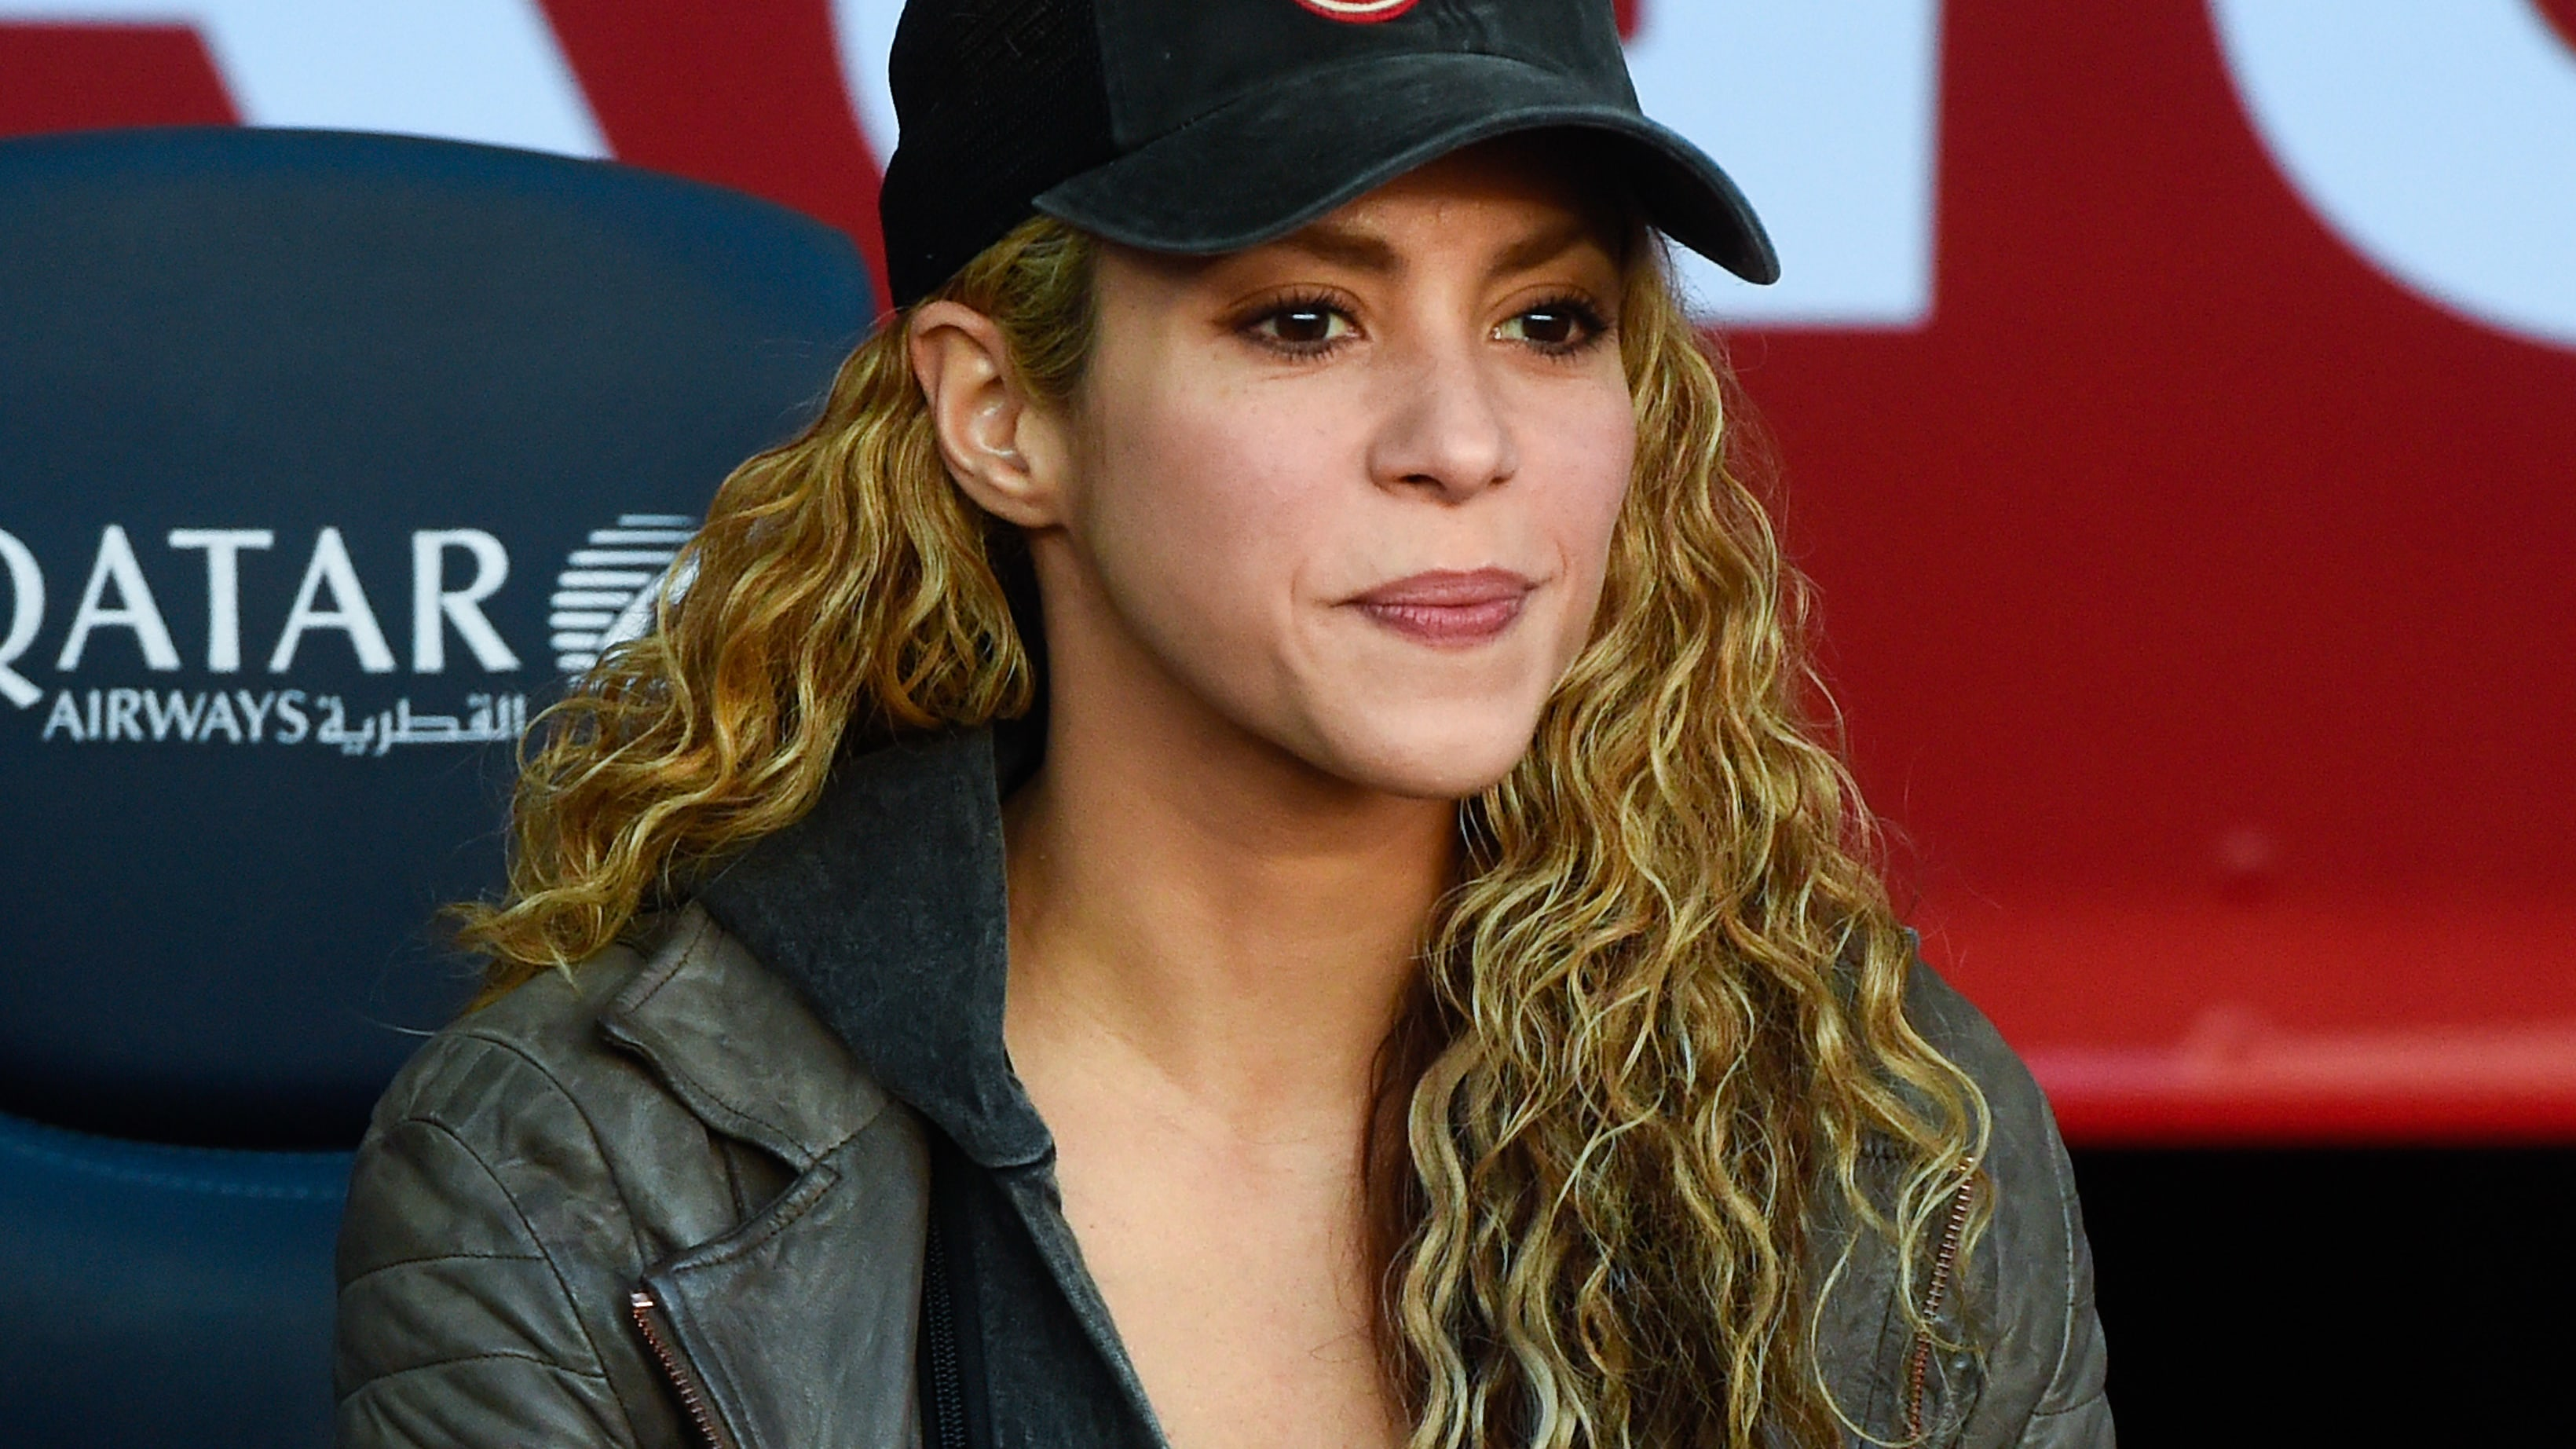 BARCELONA, SPAIN - NOVEMBER 28:  Shakira looks on ahead of the La Liga match between FC Barcelona and Real Sociedad de Futbol at Camp Nou on November 28, 2015 in Barcelona, Spain.  (Photo by David Ramos/Getty Images)